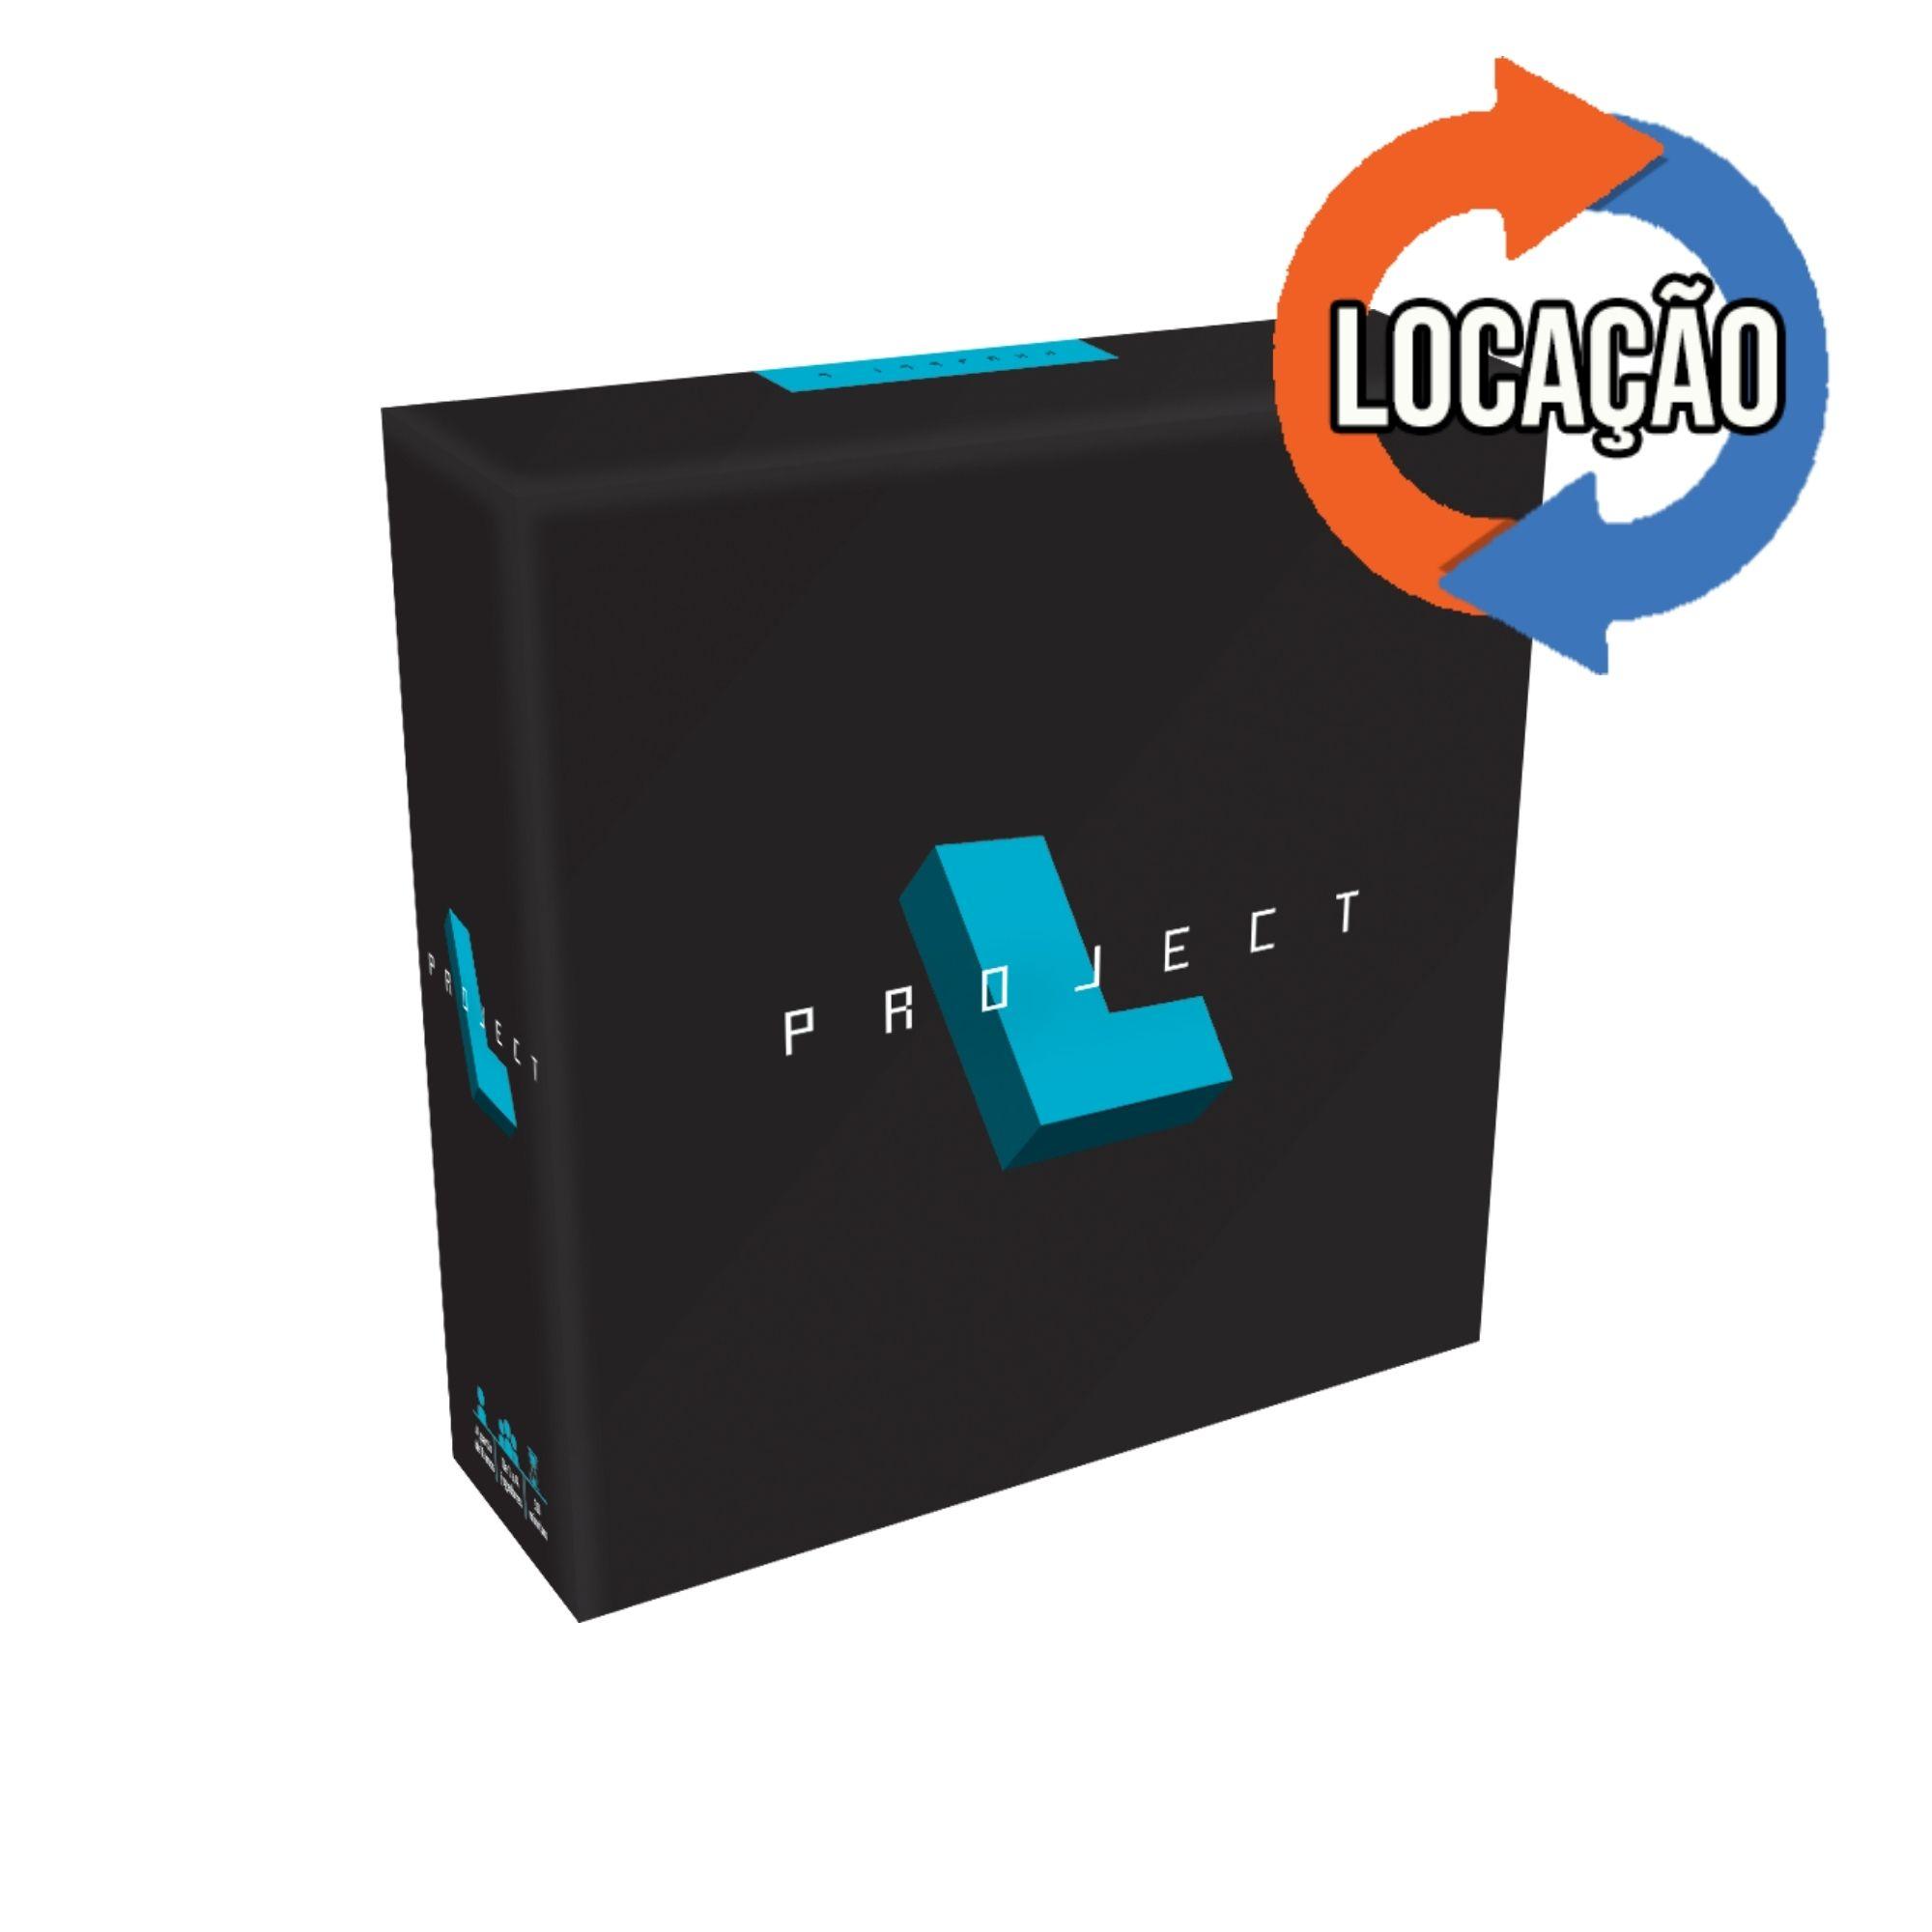 Project L (Locação)